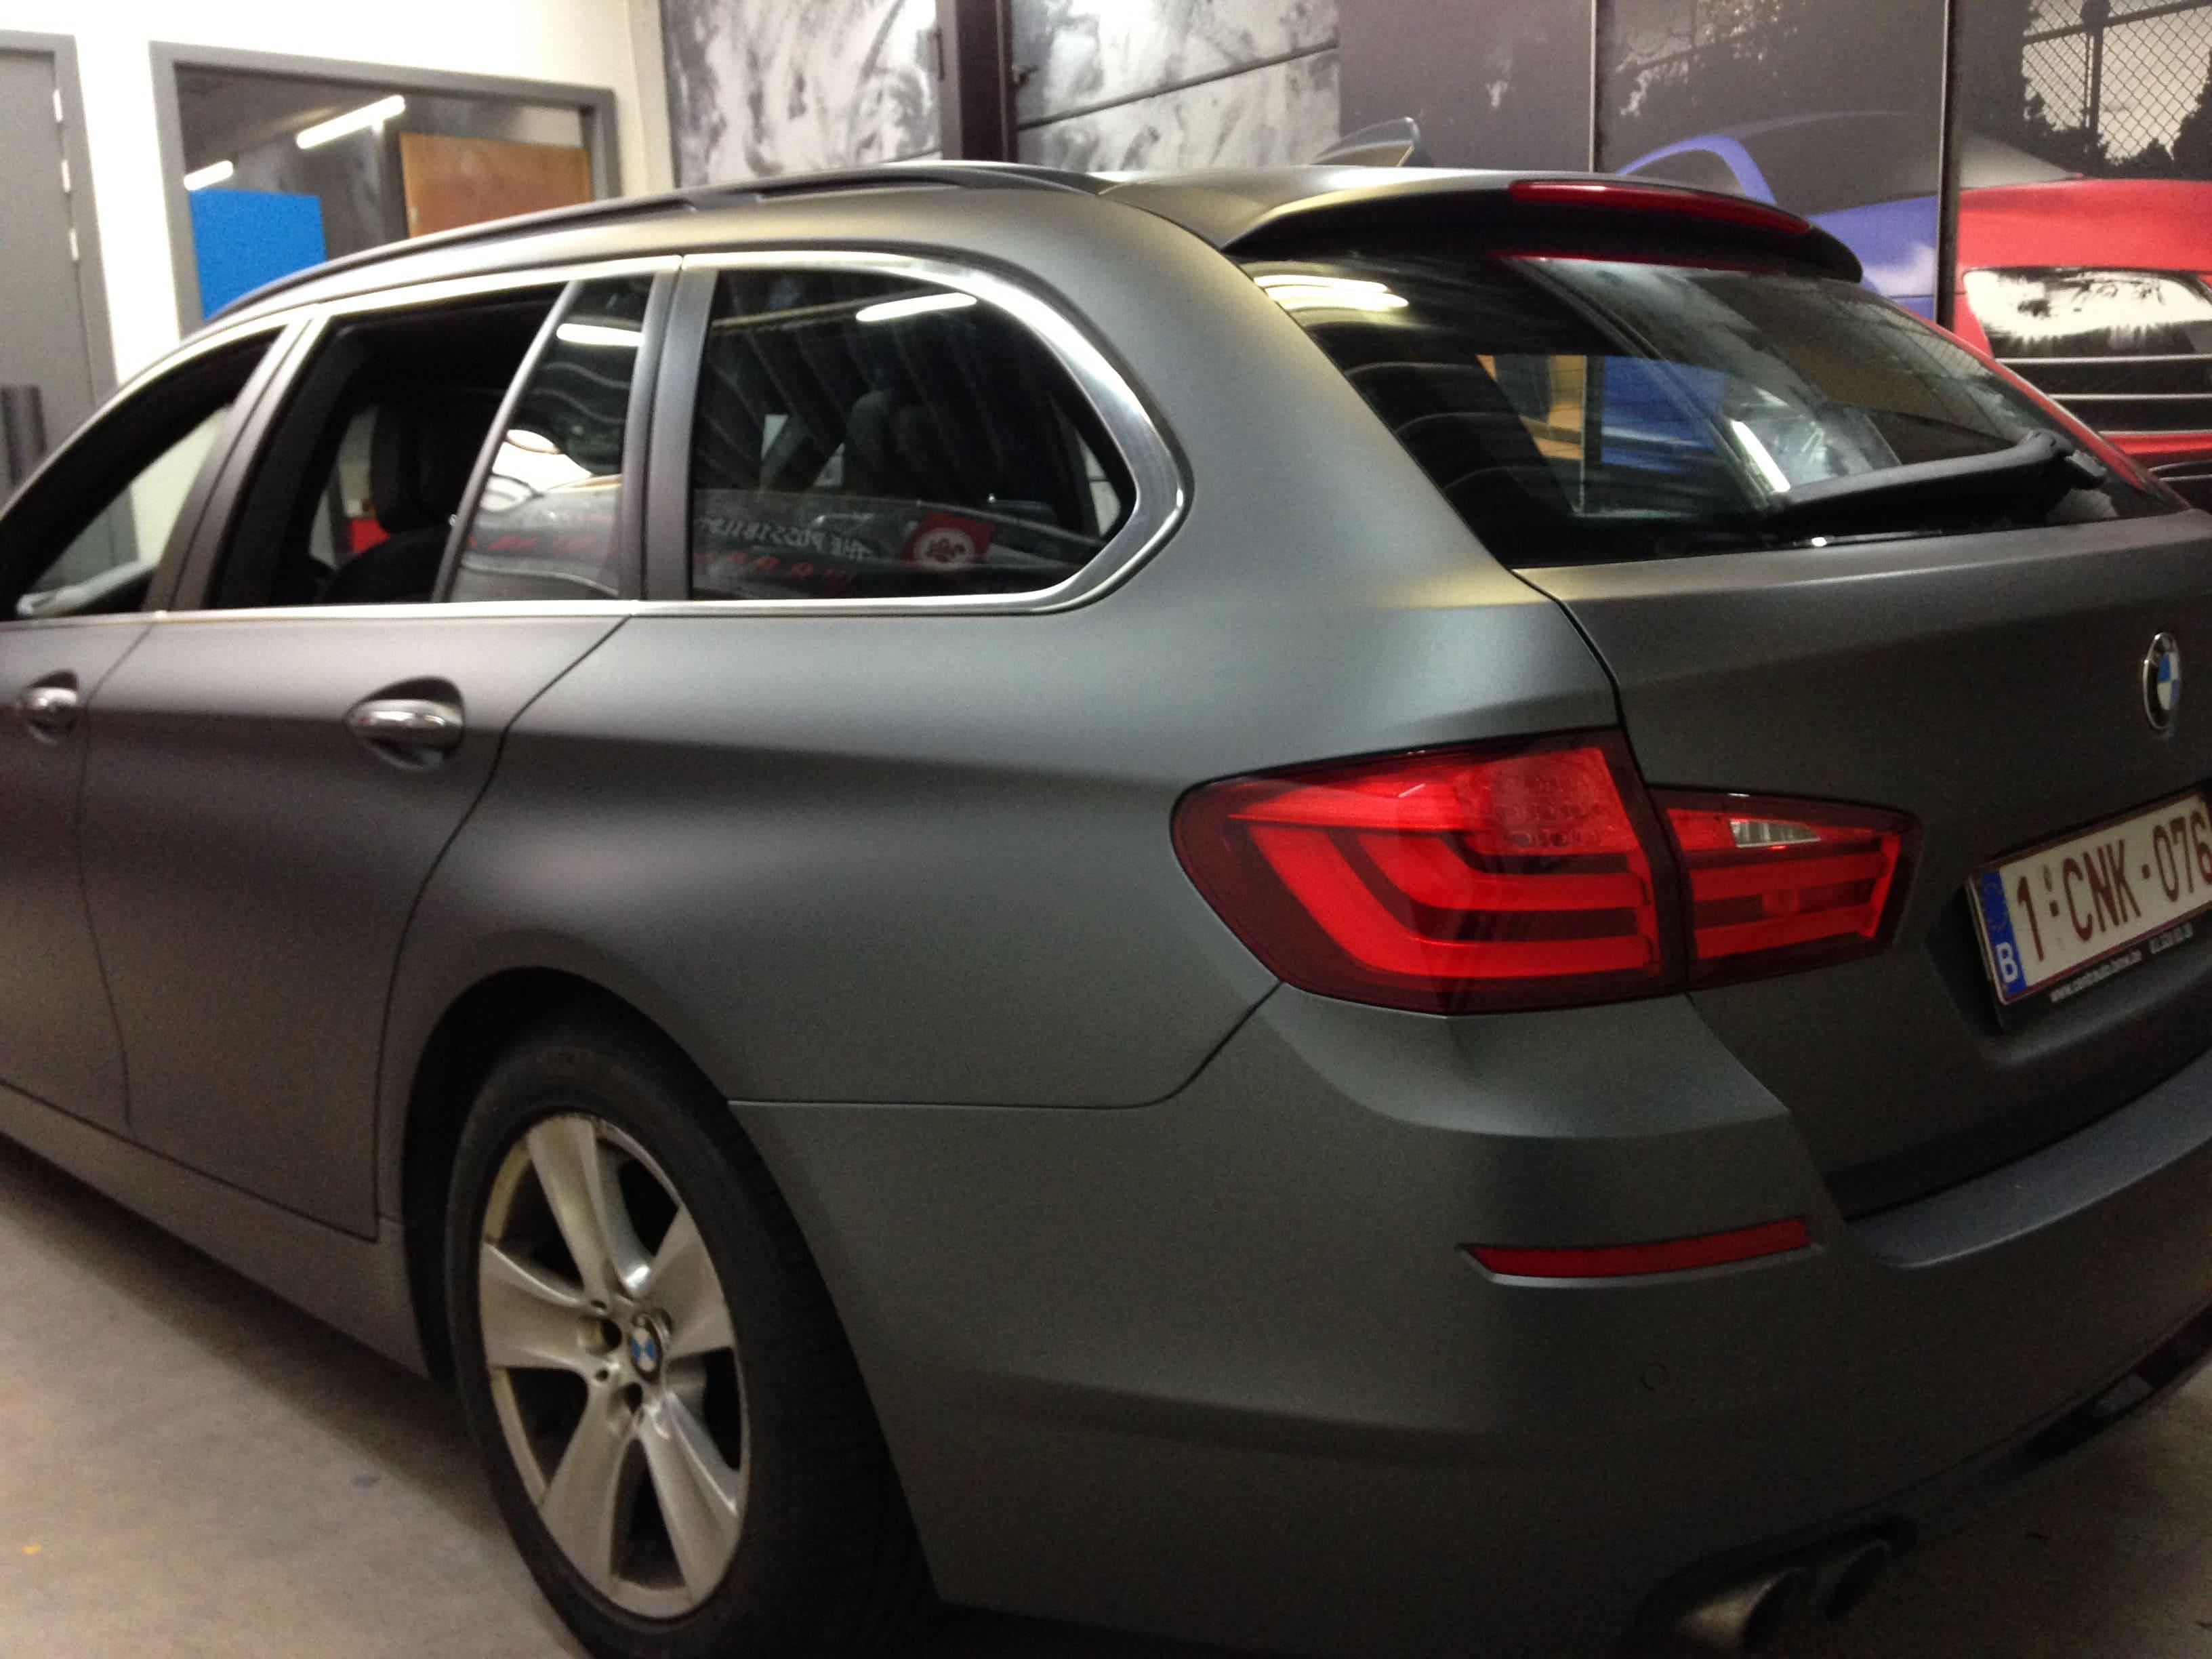 BMW 5 Serie met Gunpowder Wrap, Carwrapping door Wrapmyride.nu Foto-nr:5267, ©2021